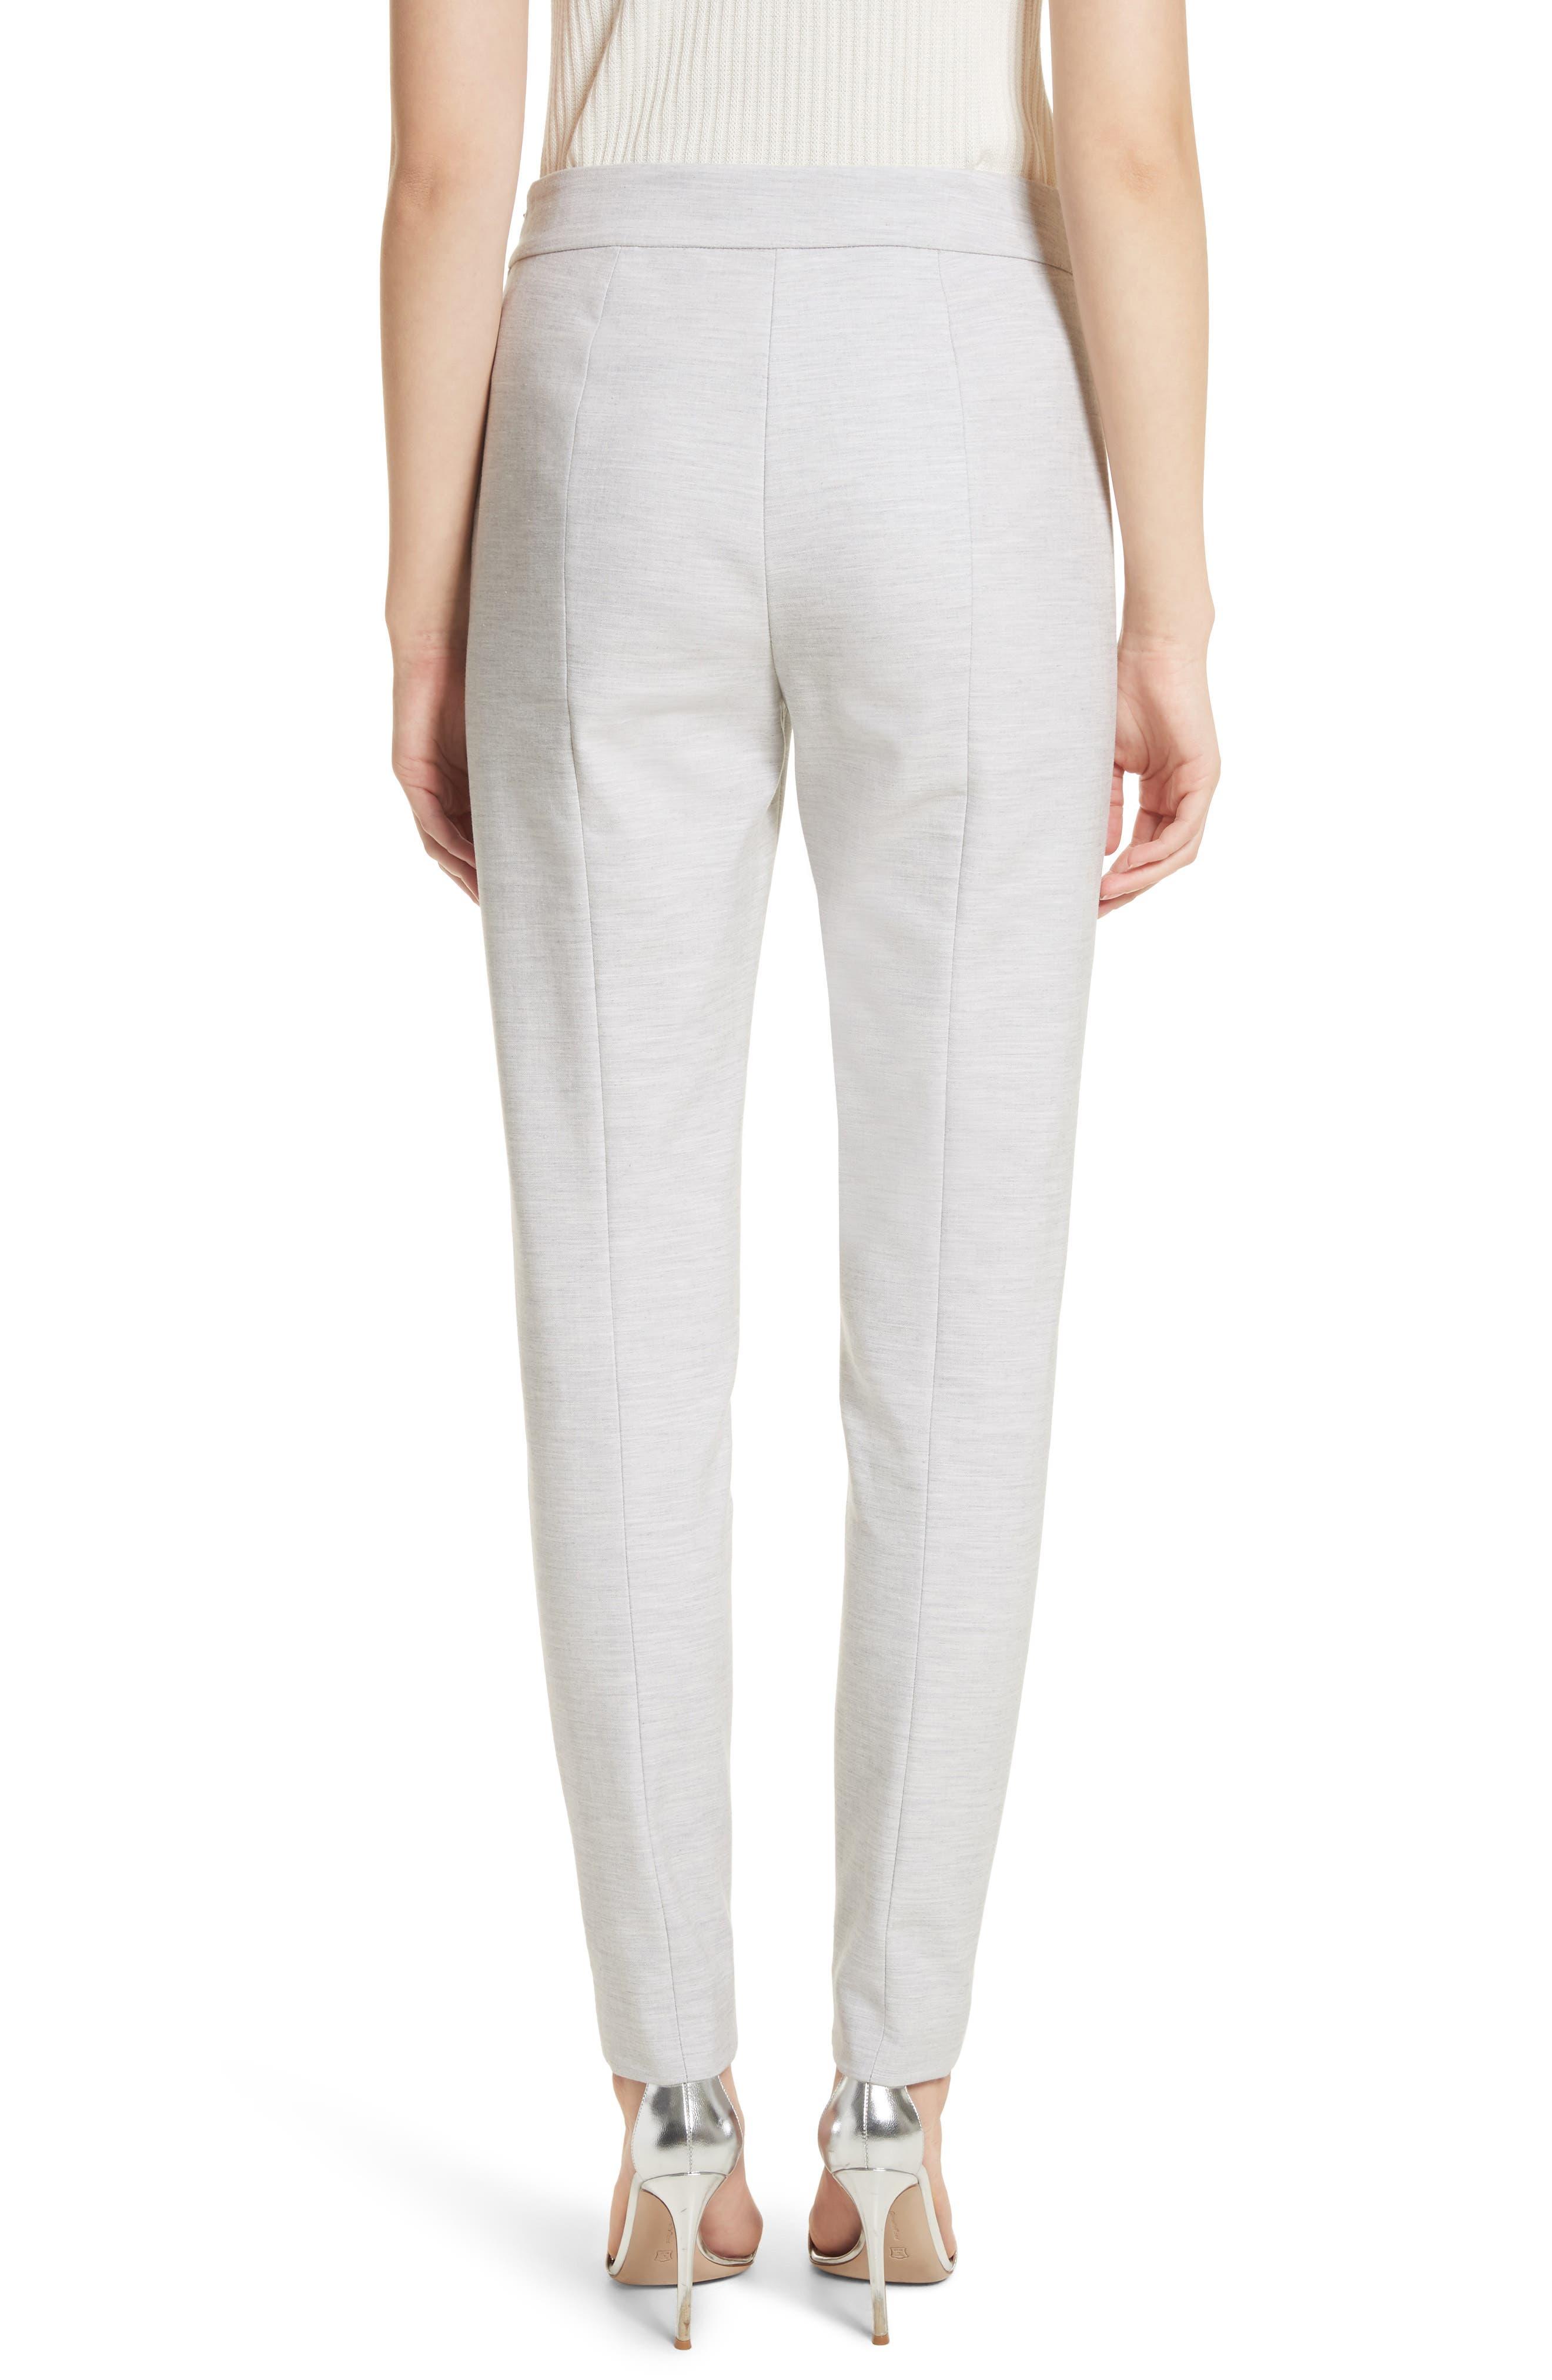 Summer Bella Double Weave Pants,                             Alternate thumbnail 7, color,                             Light Grey Melange